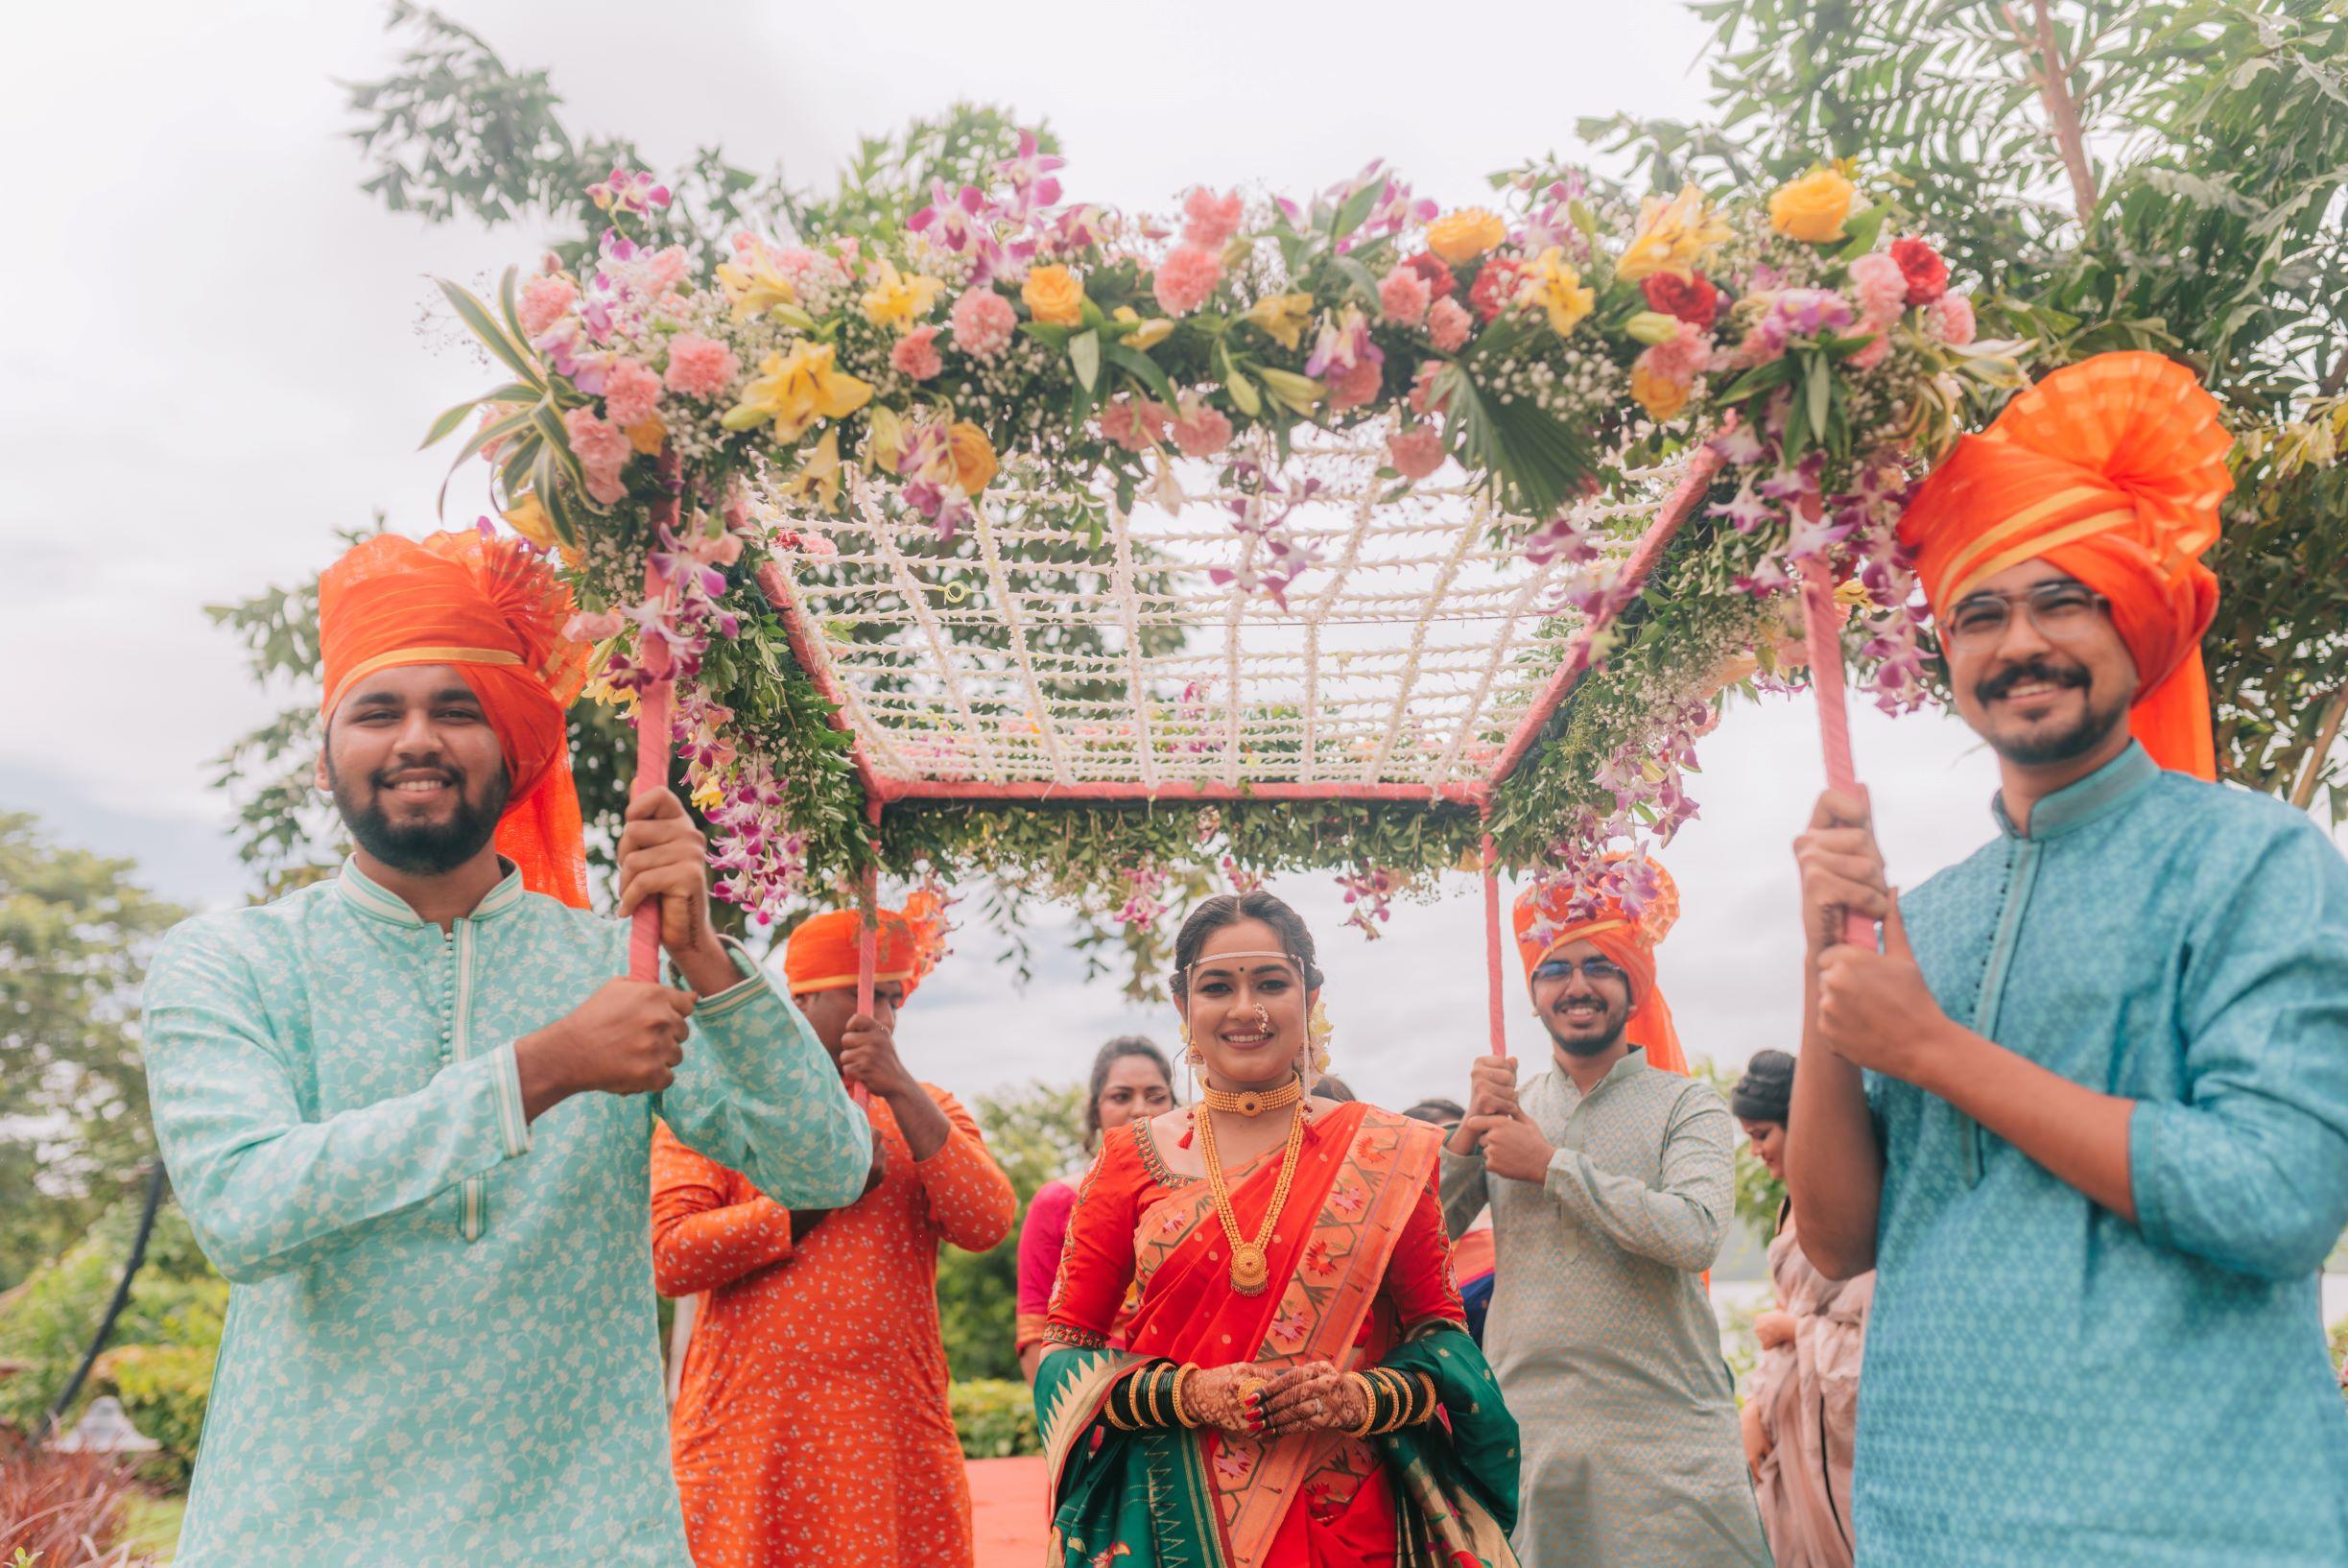 maharashtrian bride enters under a floral chhatri